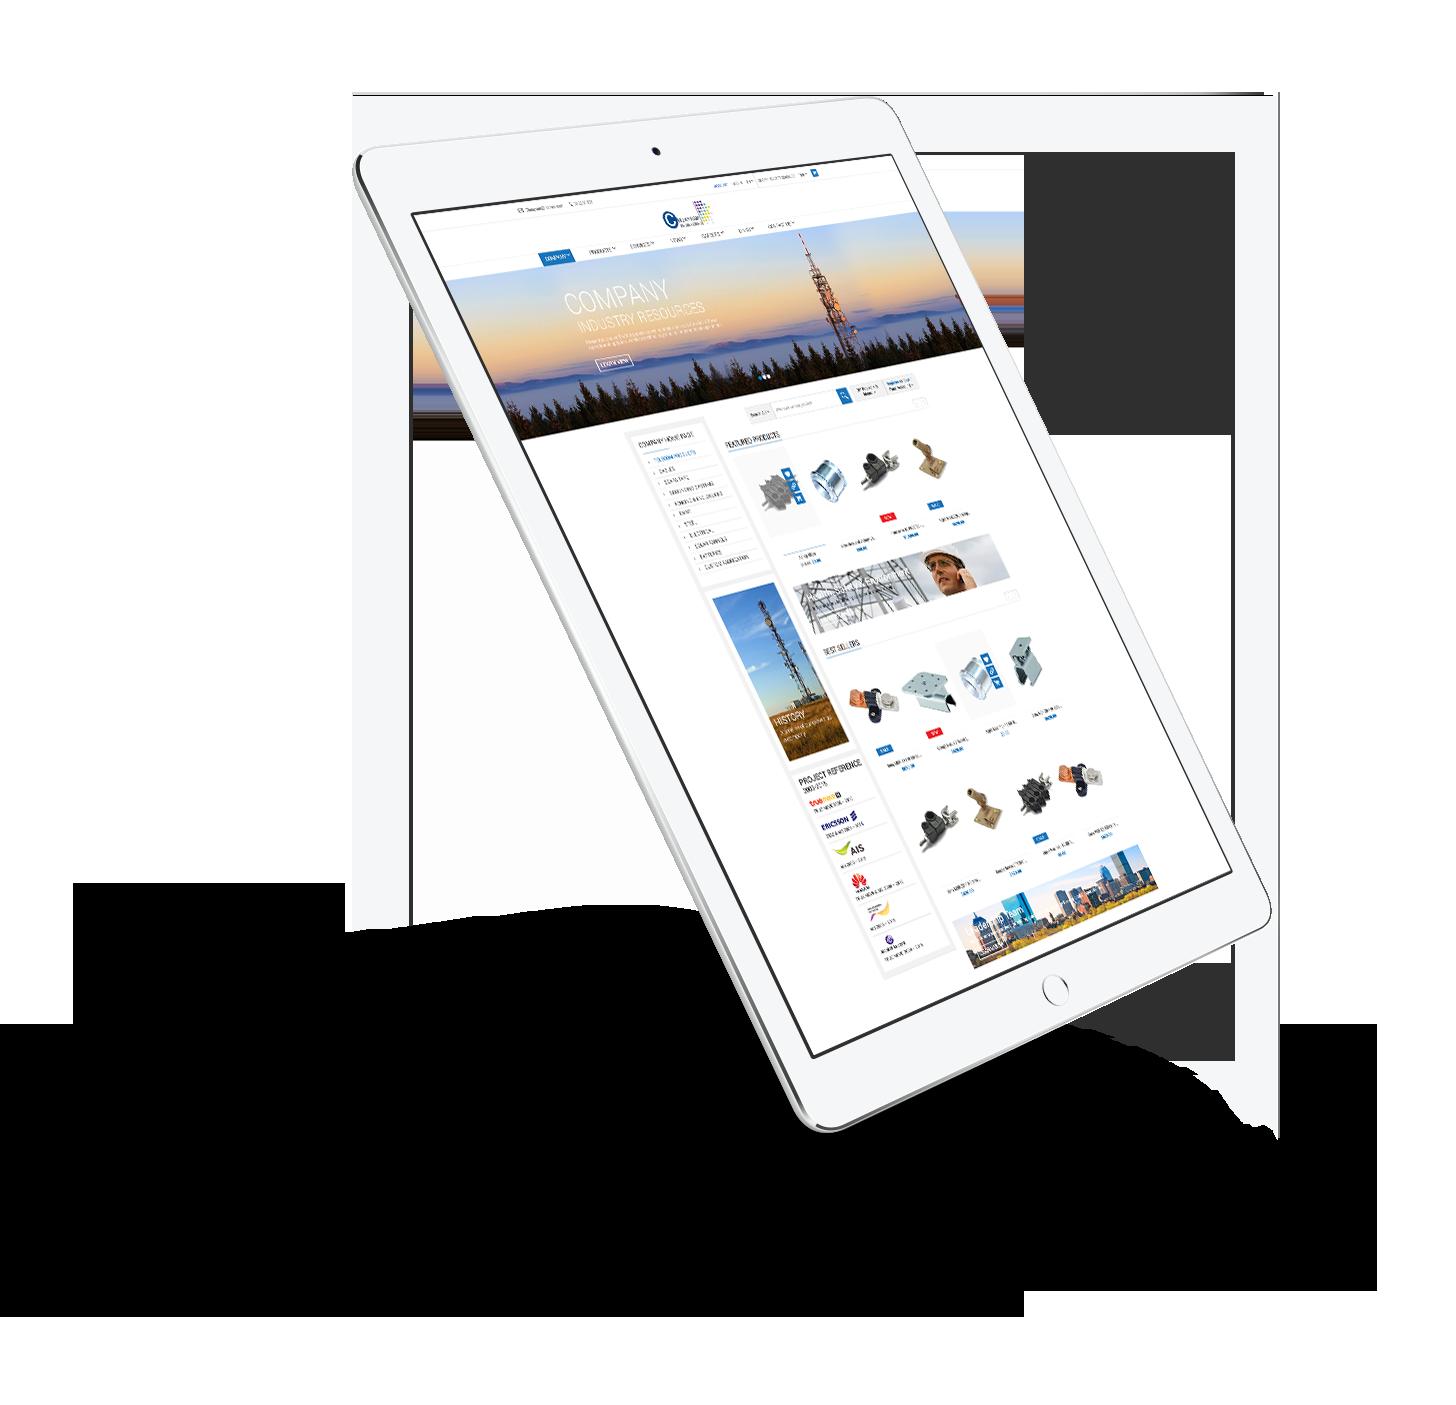 chuayram-iPad